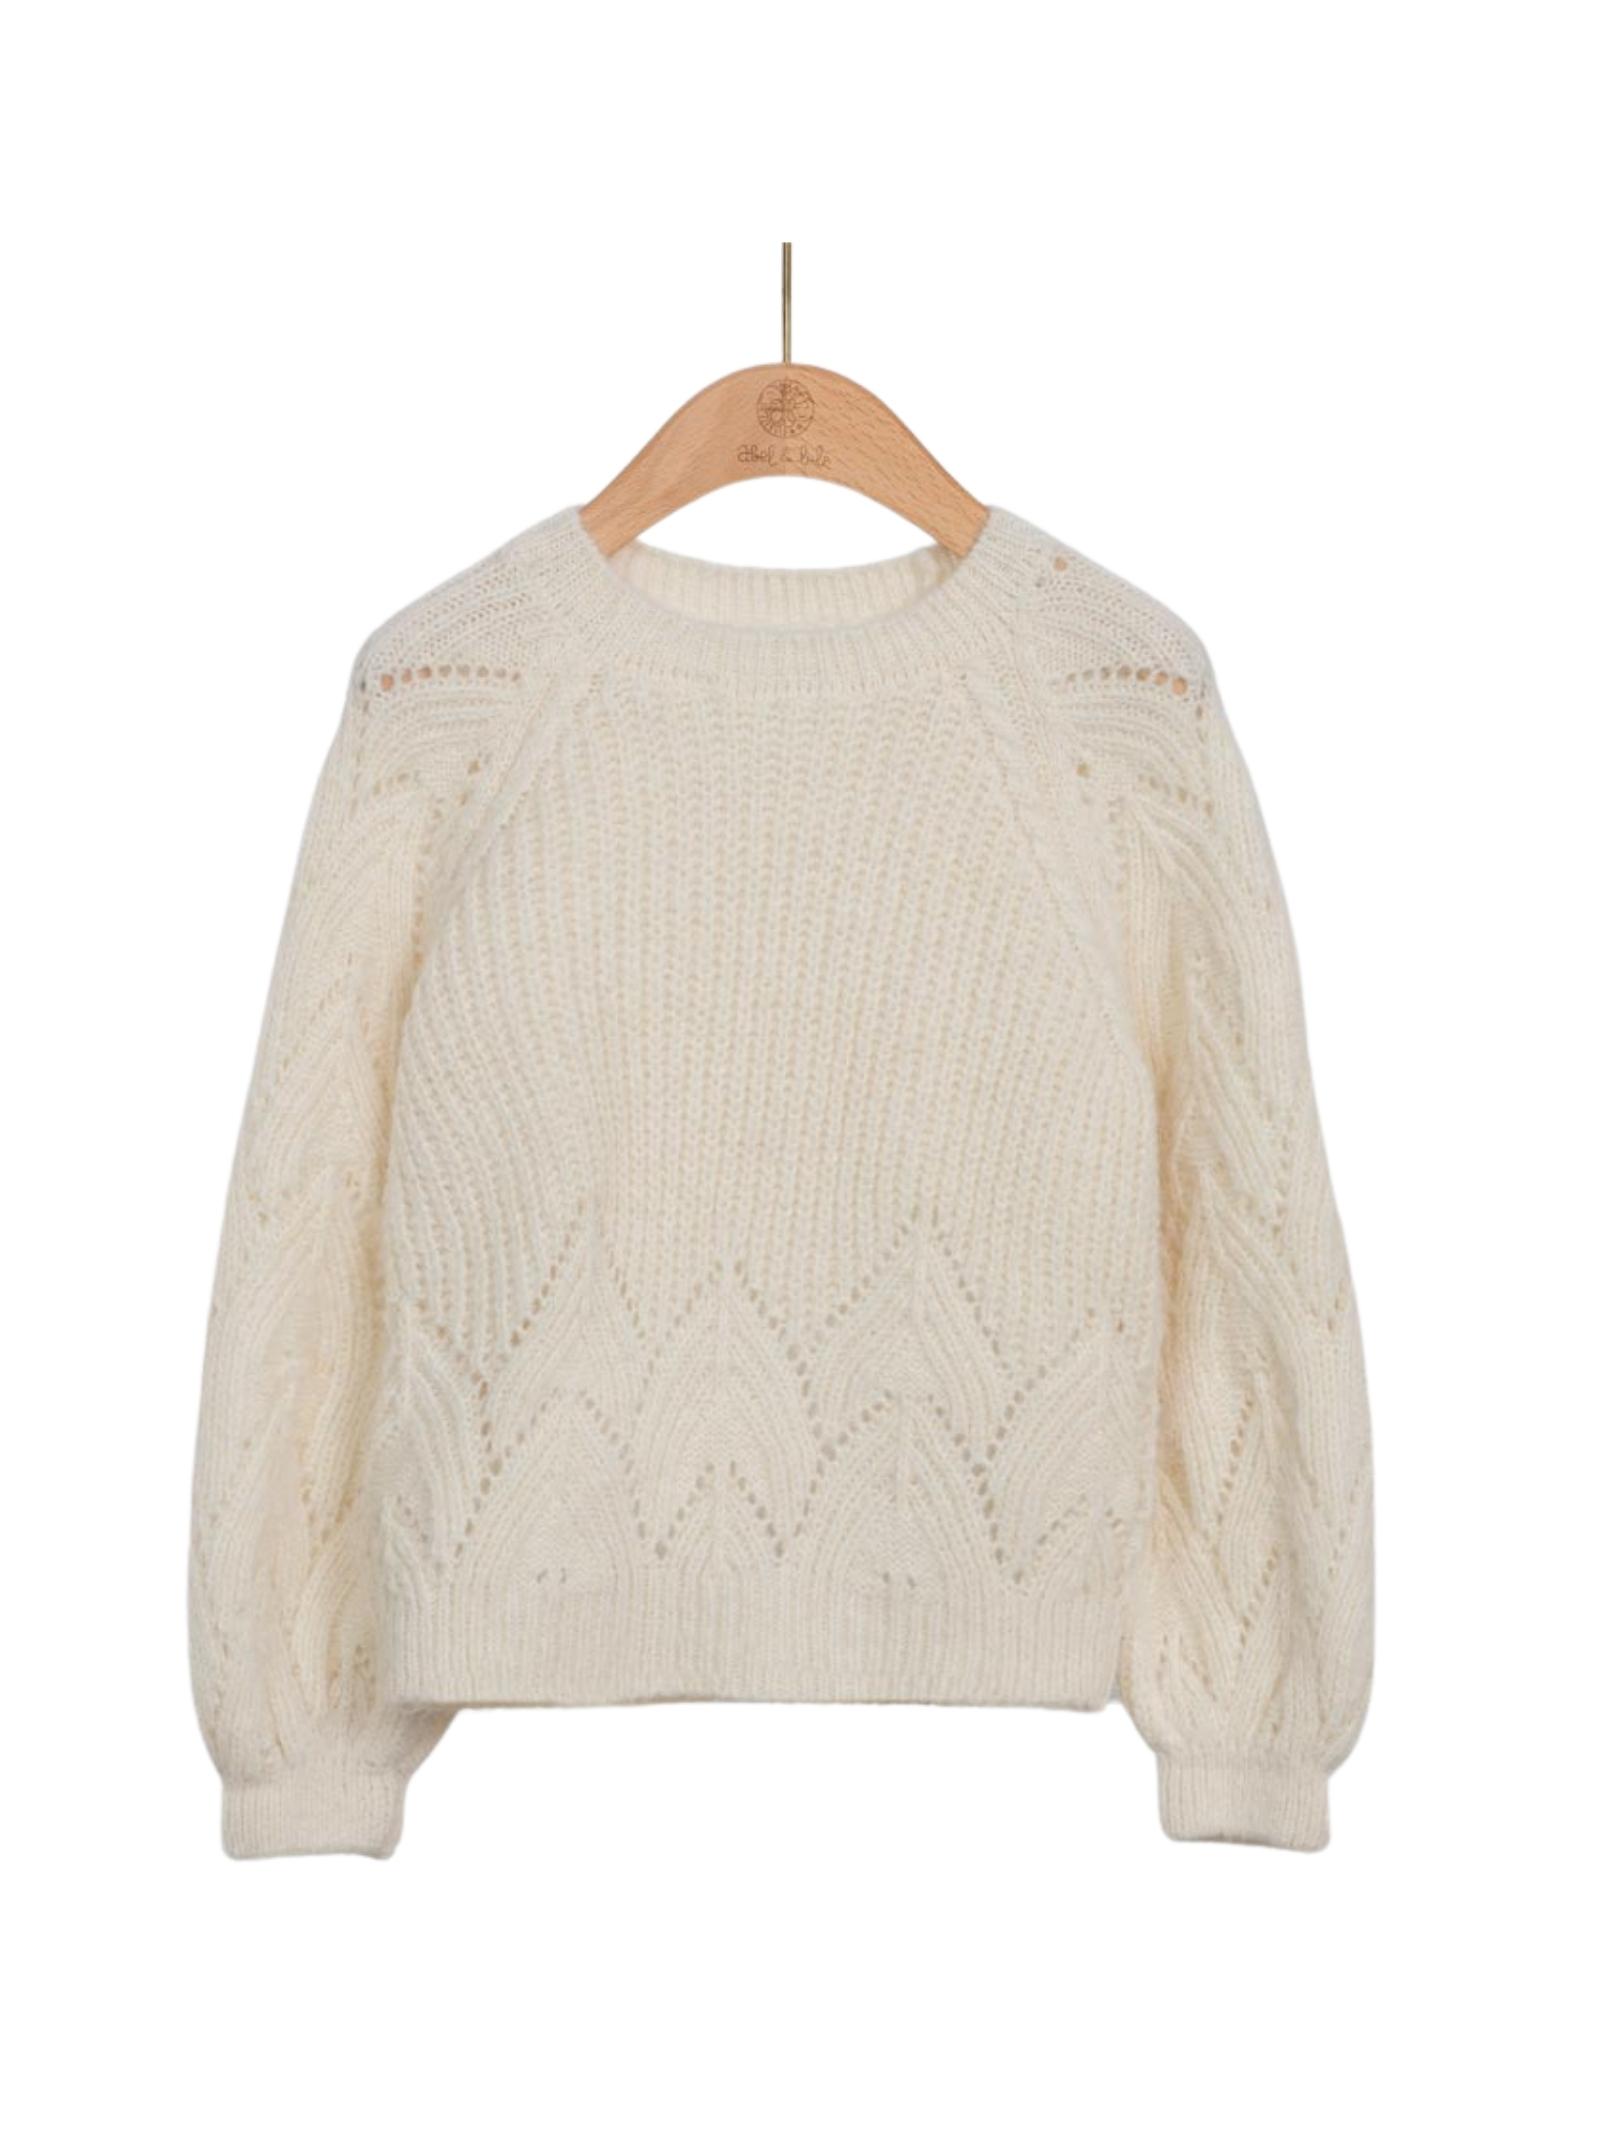 Streech Girl Sweater ABEL&LULA | Sweaters | 5835040